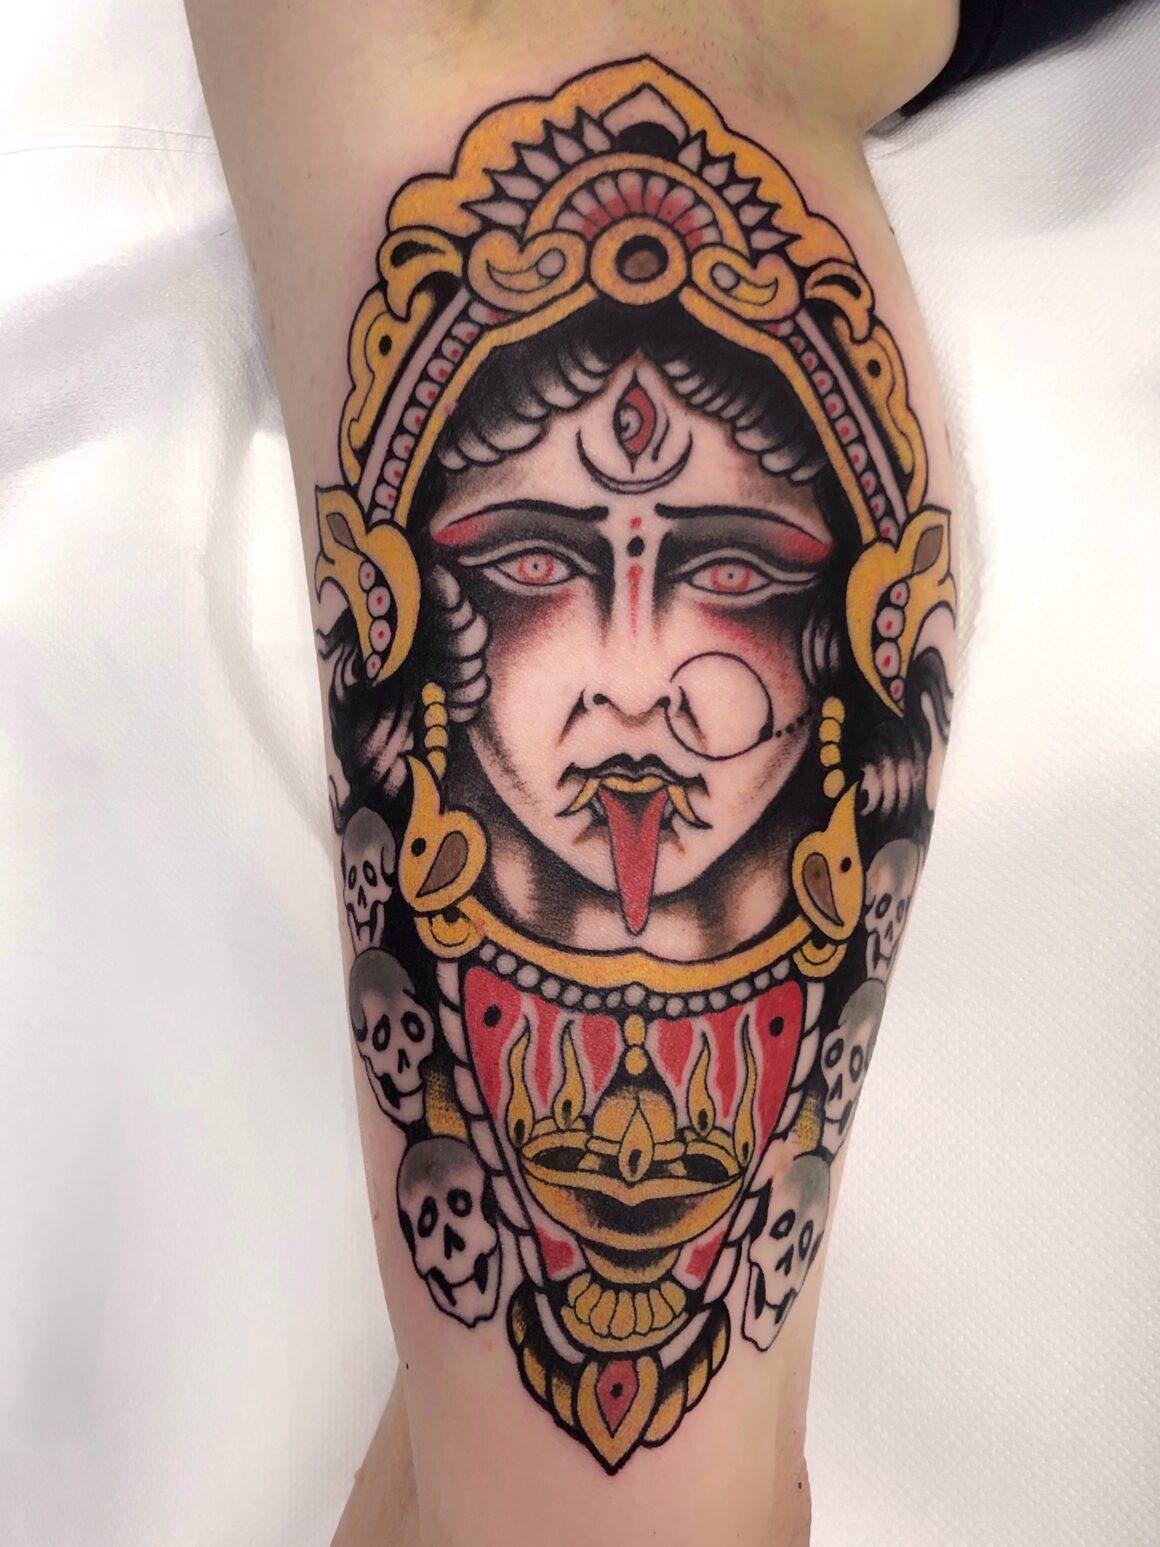 Simone Sbam, Creature Tattoo, Savona